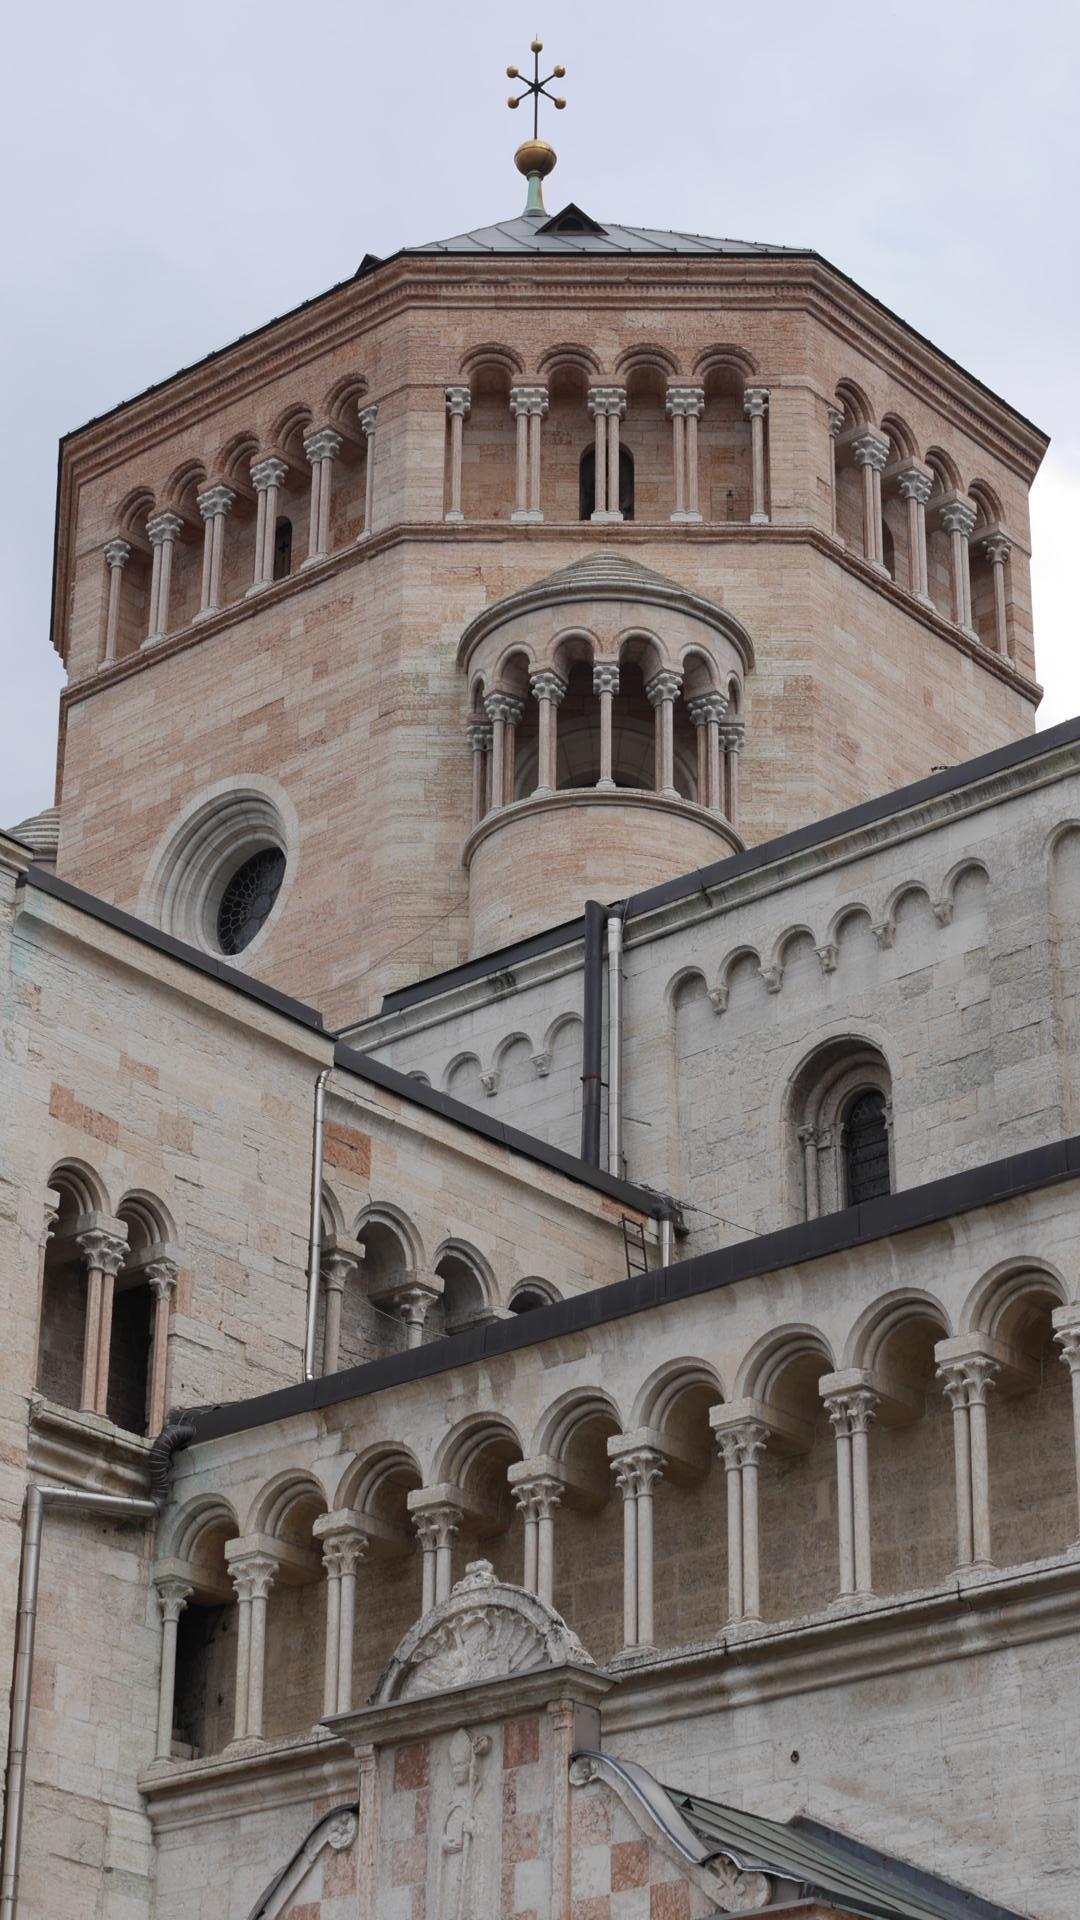 Duomo di Trento, tiburio